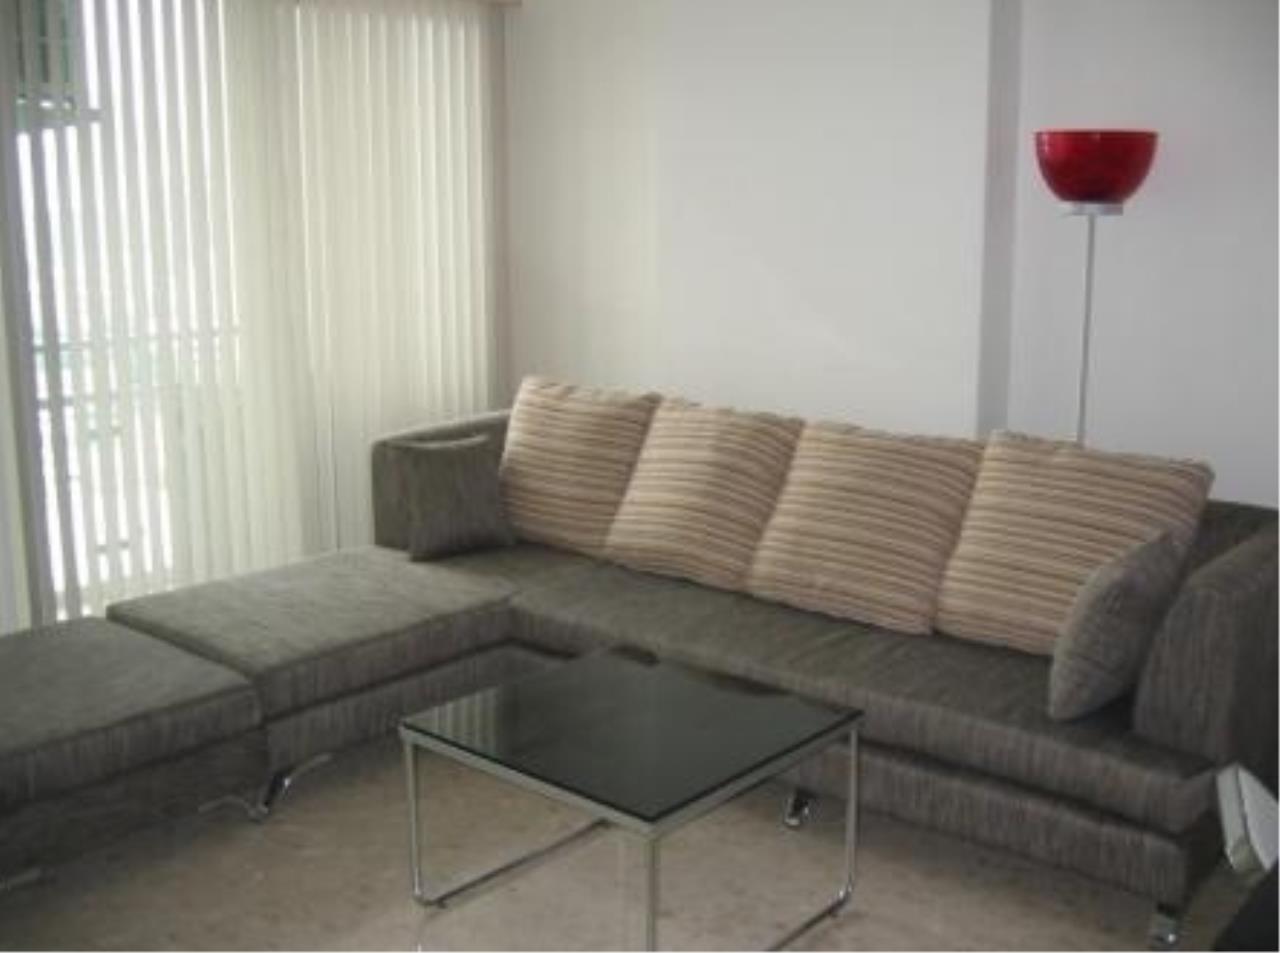 RE/MAX Properties Agency's 1 Bedroom for Rent Nusasiri Grand Condo 3